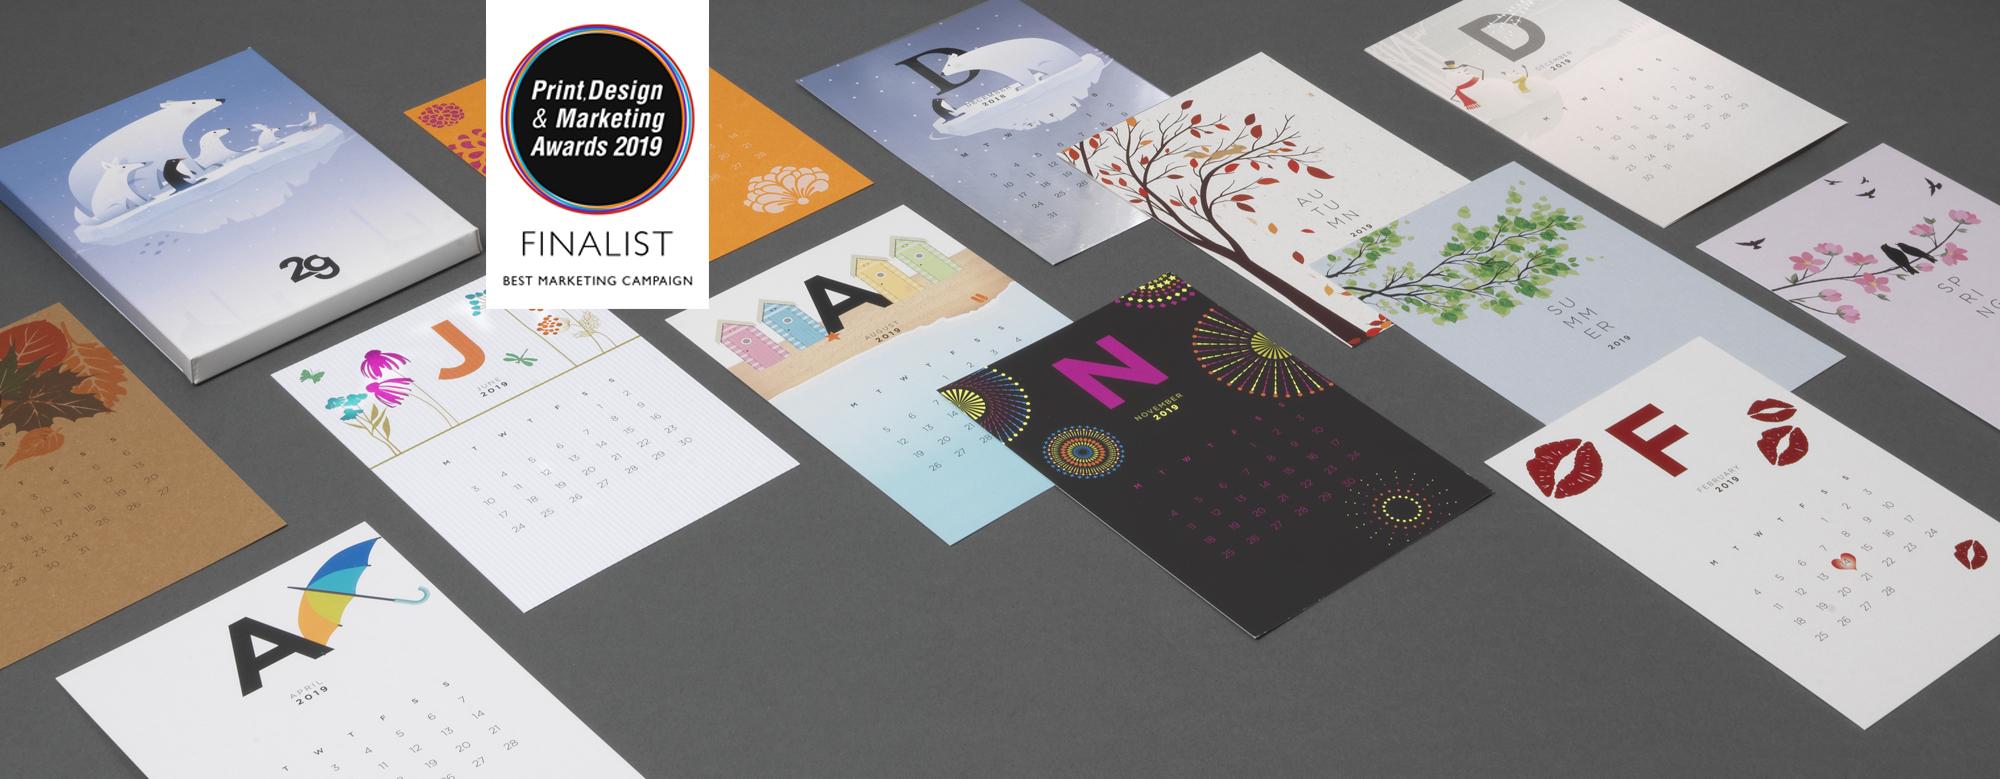 calendar-slider-award-1